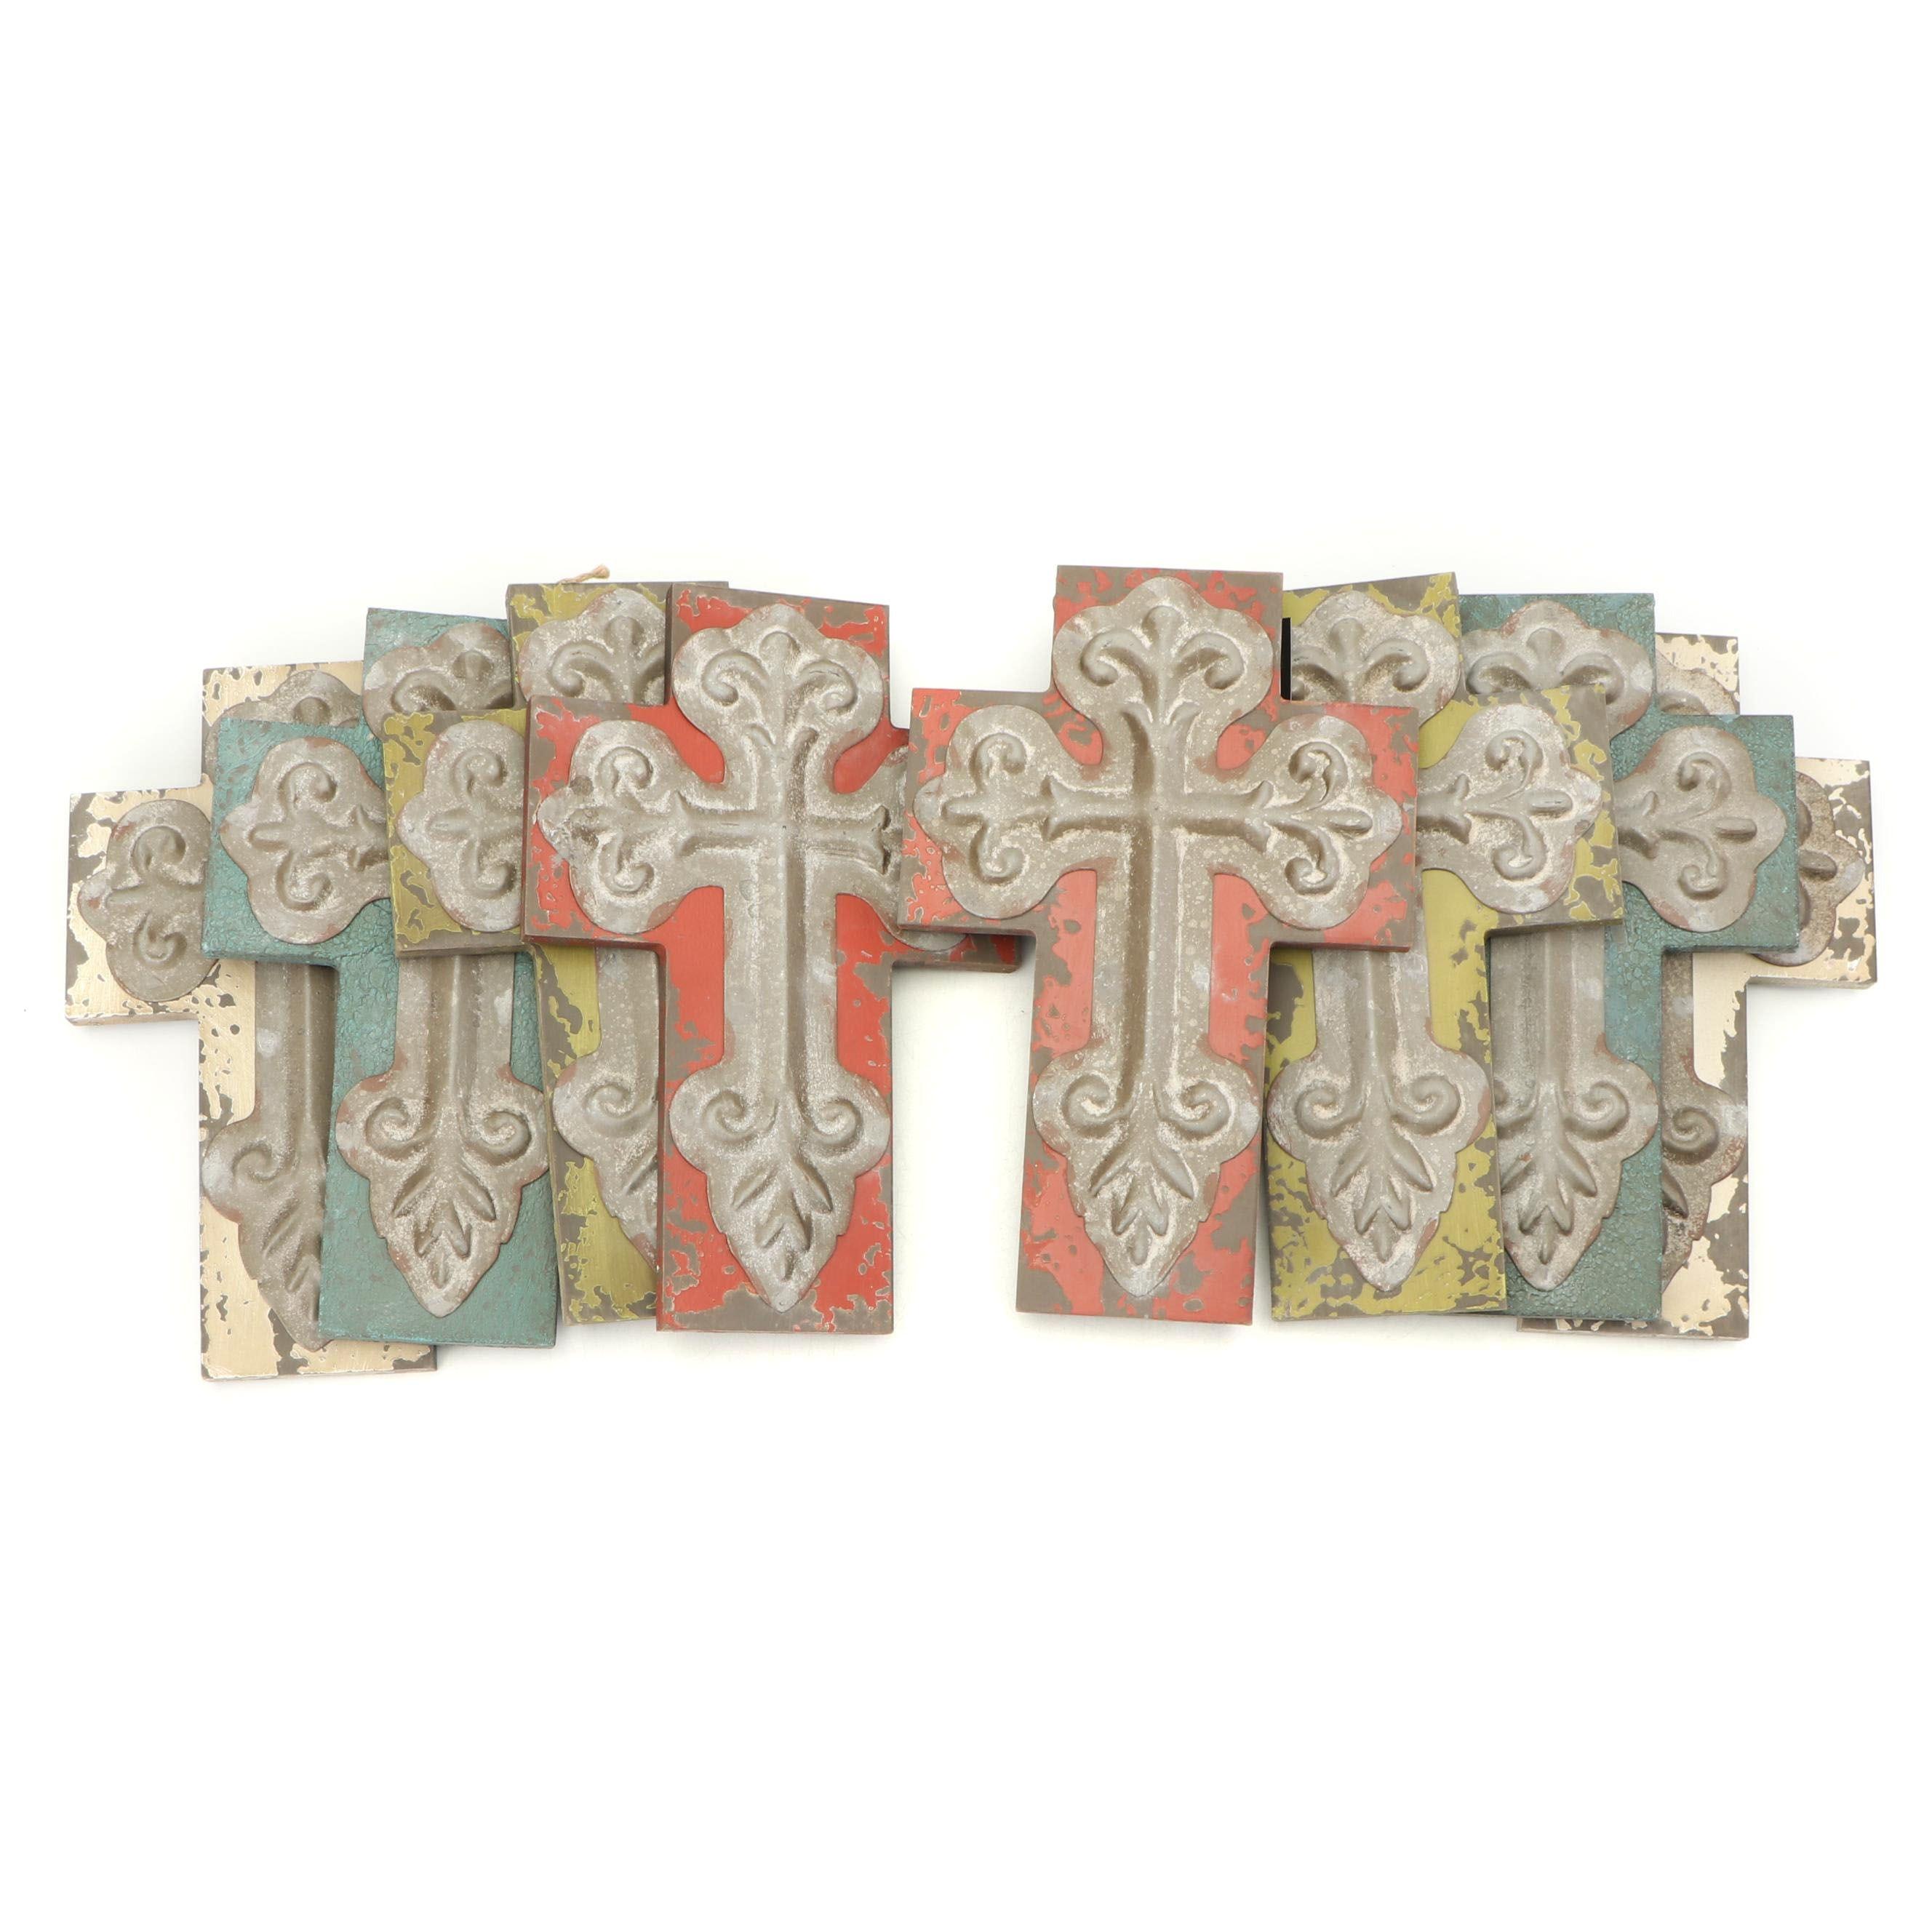 Decorative Wood and Metal Crosses